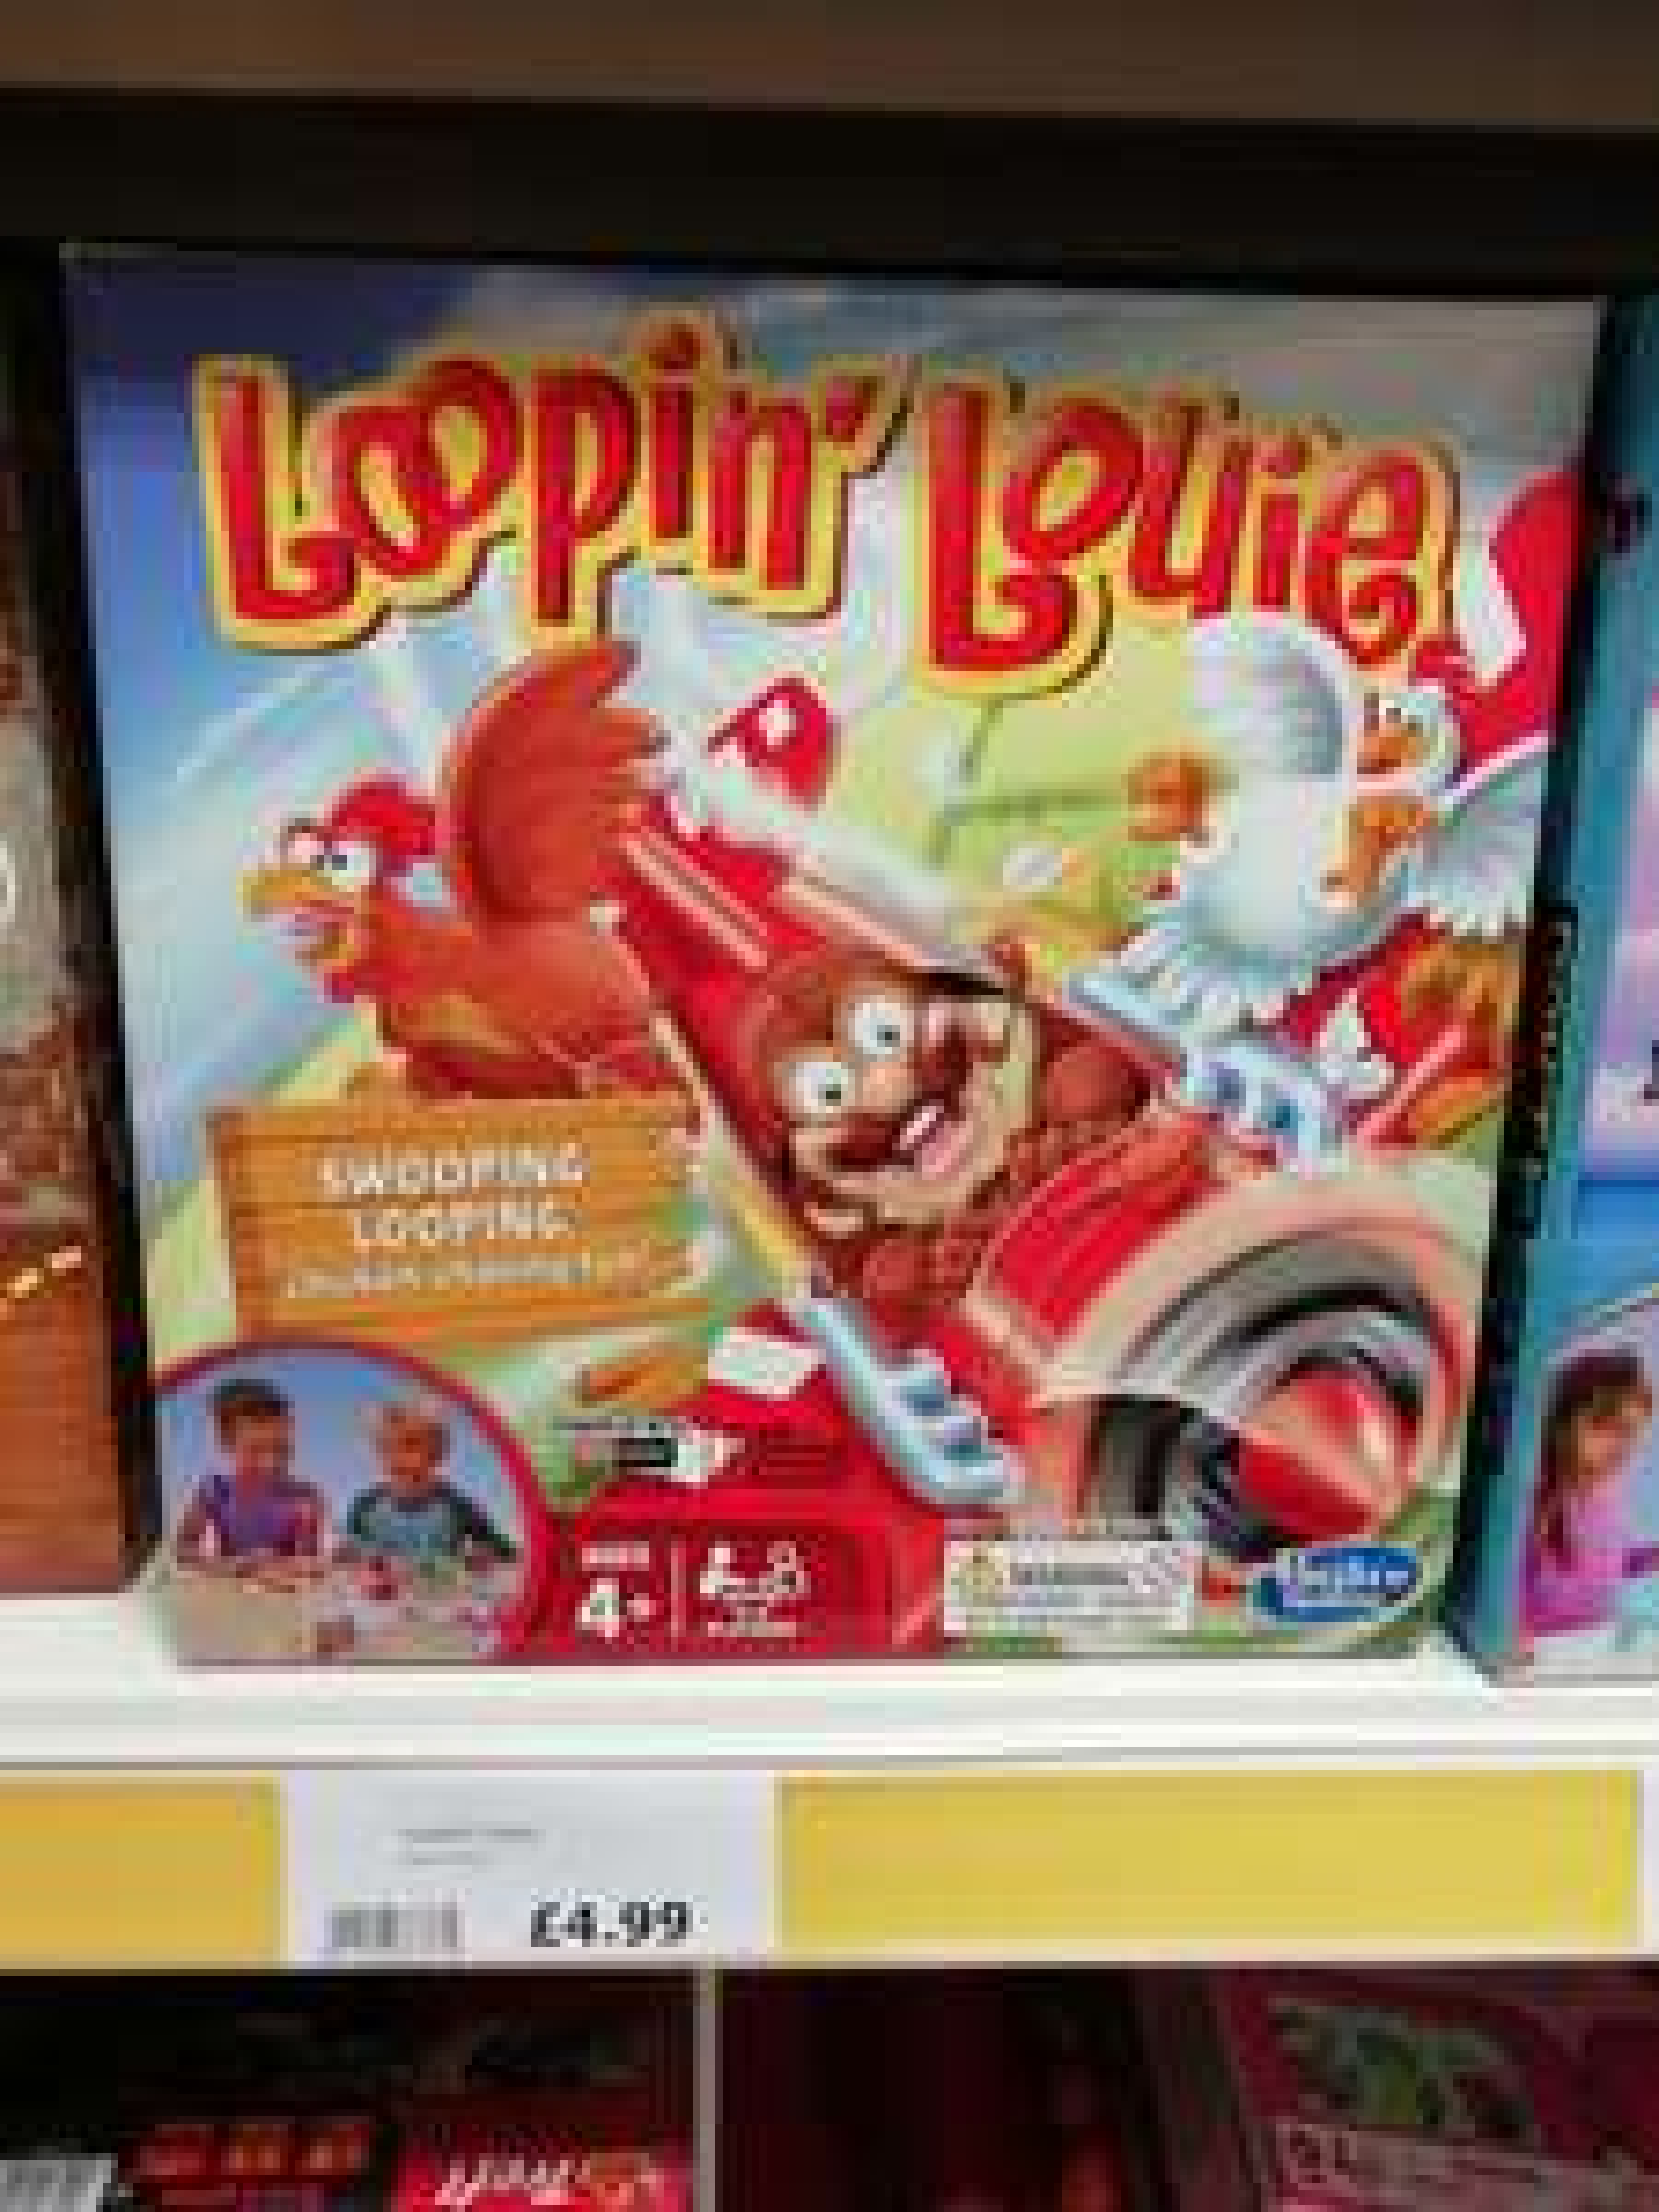 Loopin Louie hasbro board game £4.99 in store @ the range (national)